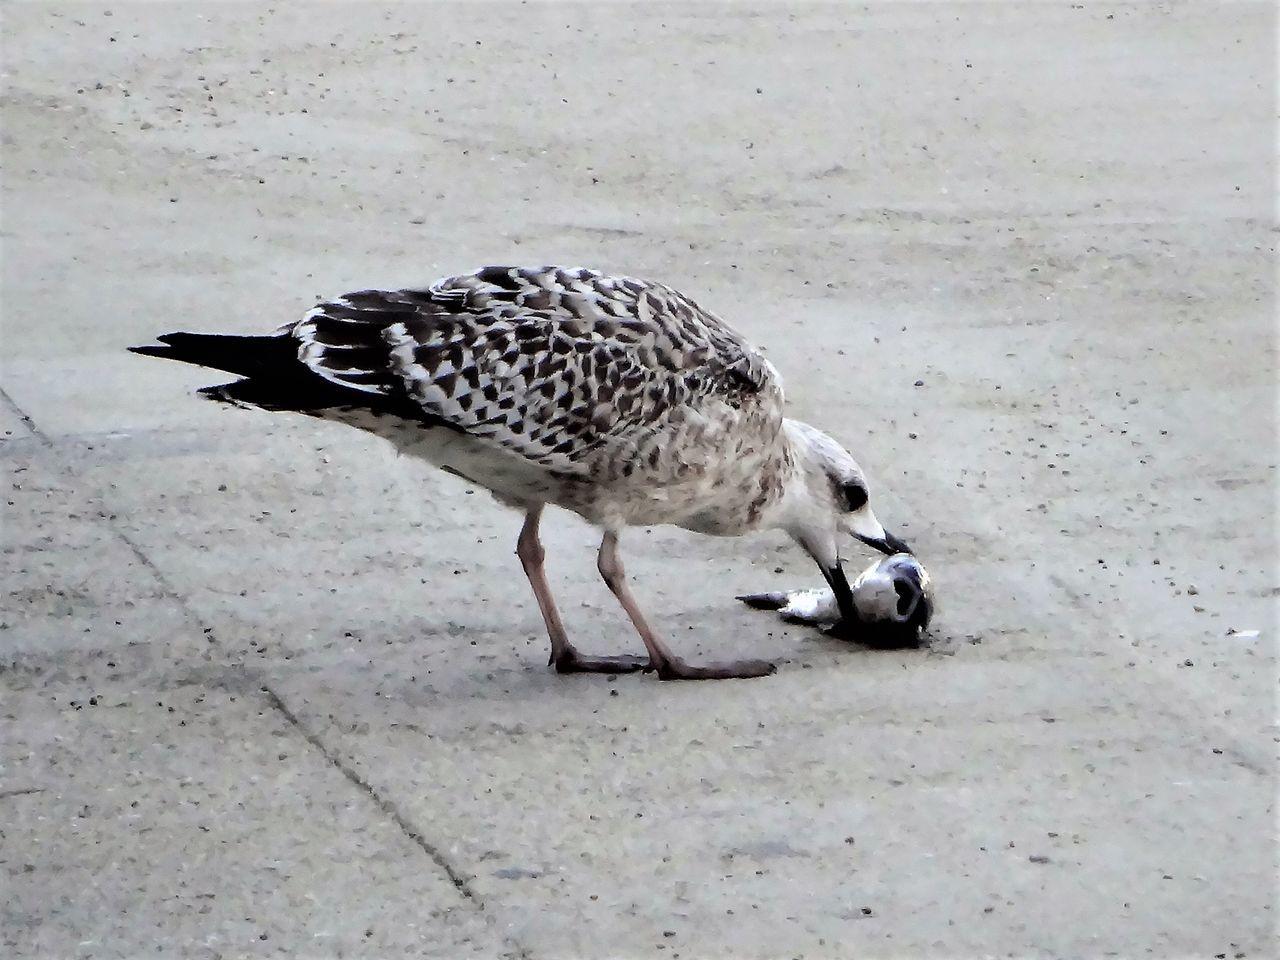 bird, animal themes, one animal, animals in the wild, animal wildlife, day, outdoors, no people, nature, perching, bird of prey